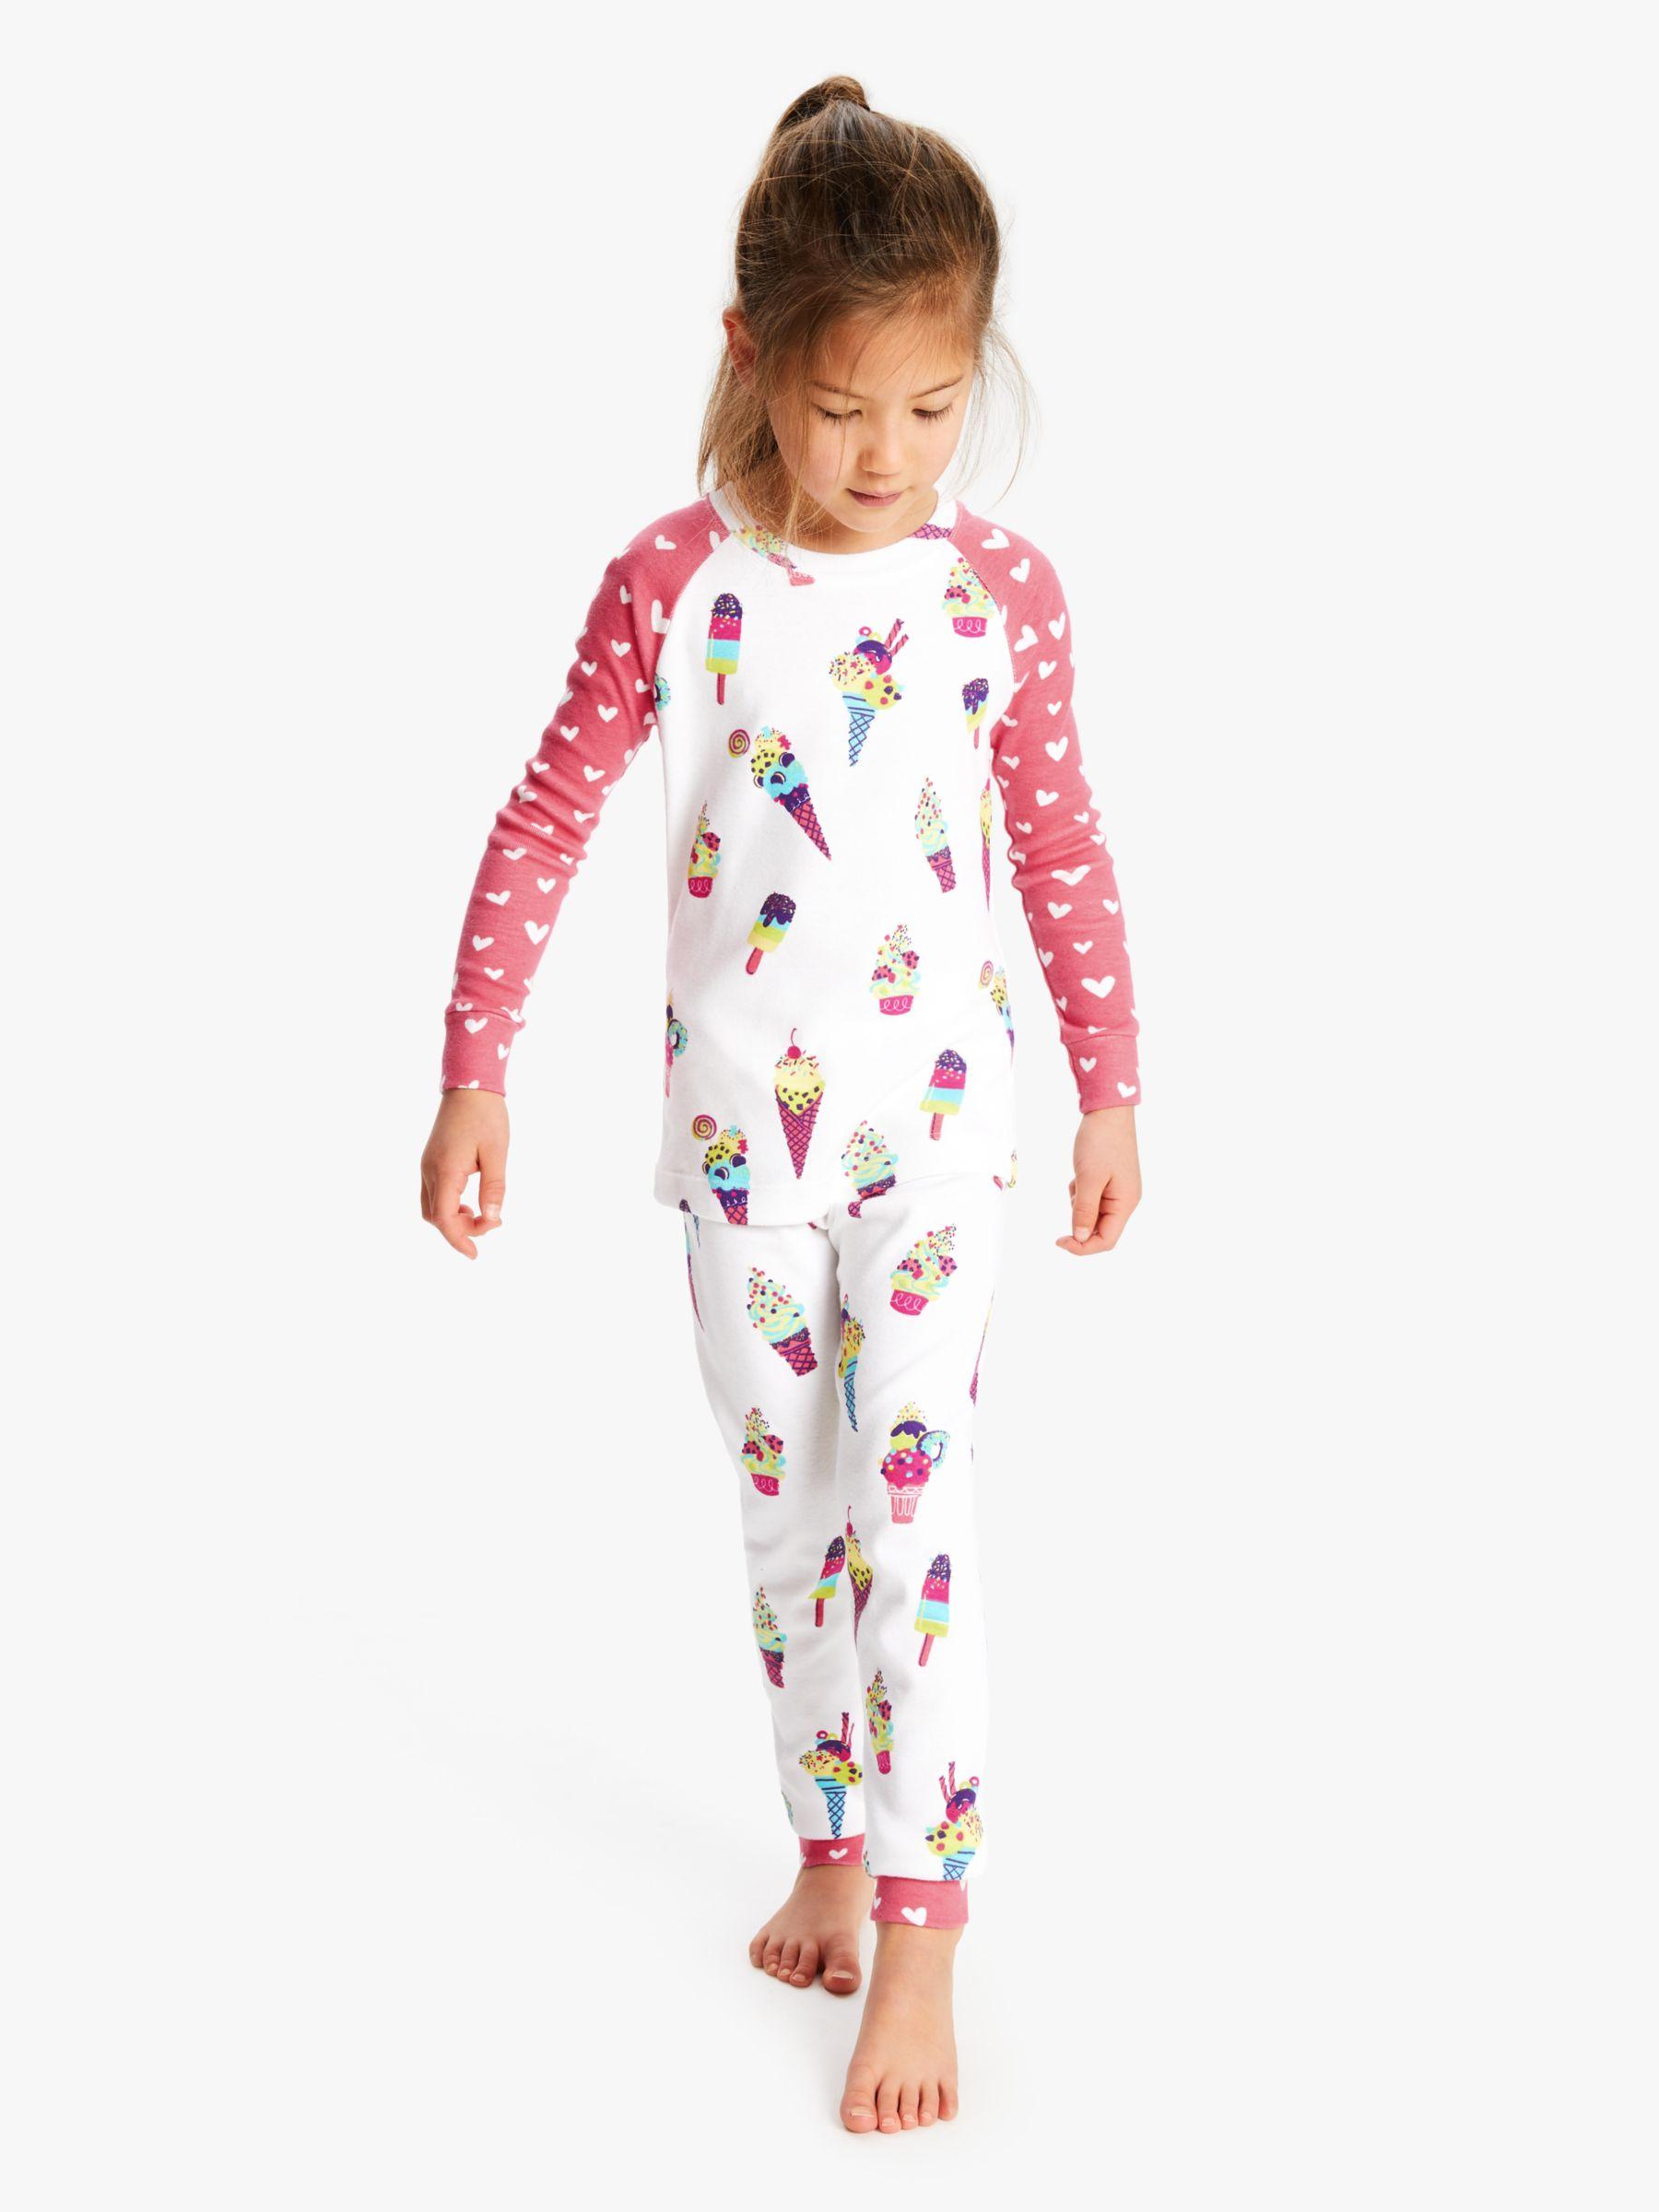 Hatley Hatley Girls' Ice Cream Print Pyjamas, White/Pink